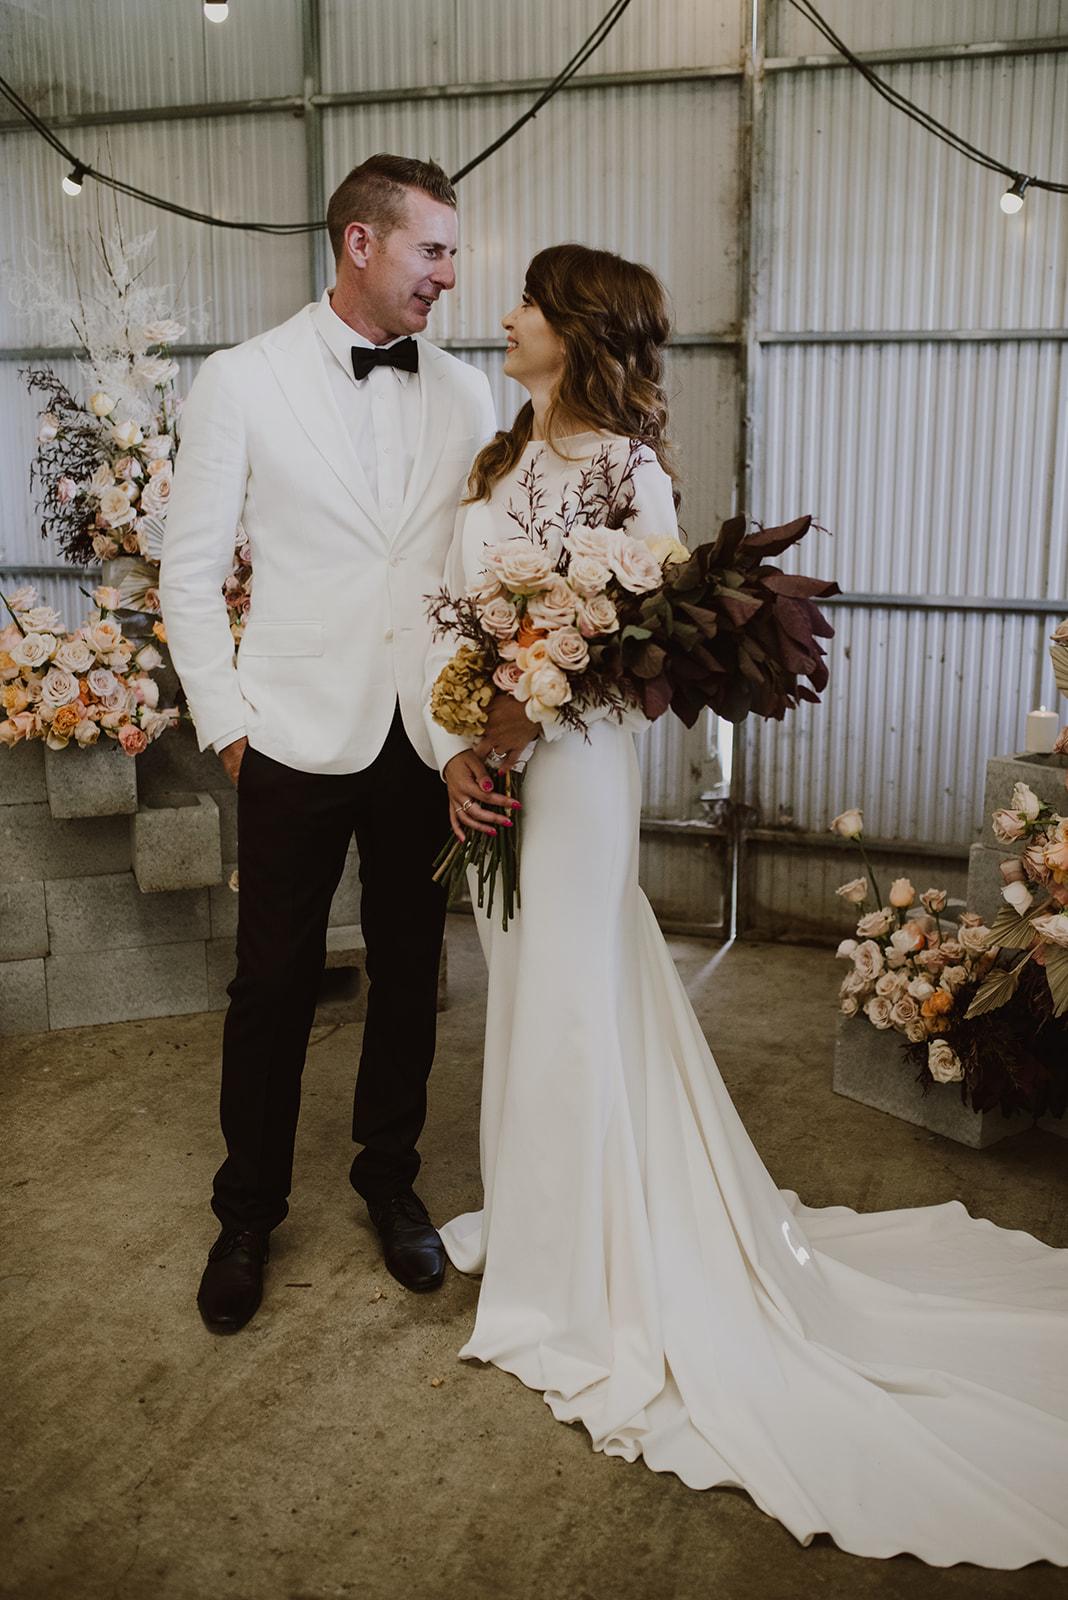 leah cruikshank photography scenic rim weddings karen willis holmes bridal gowns venue